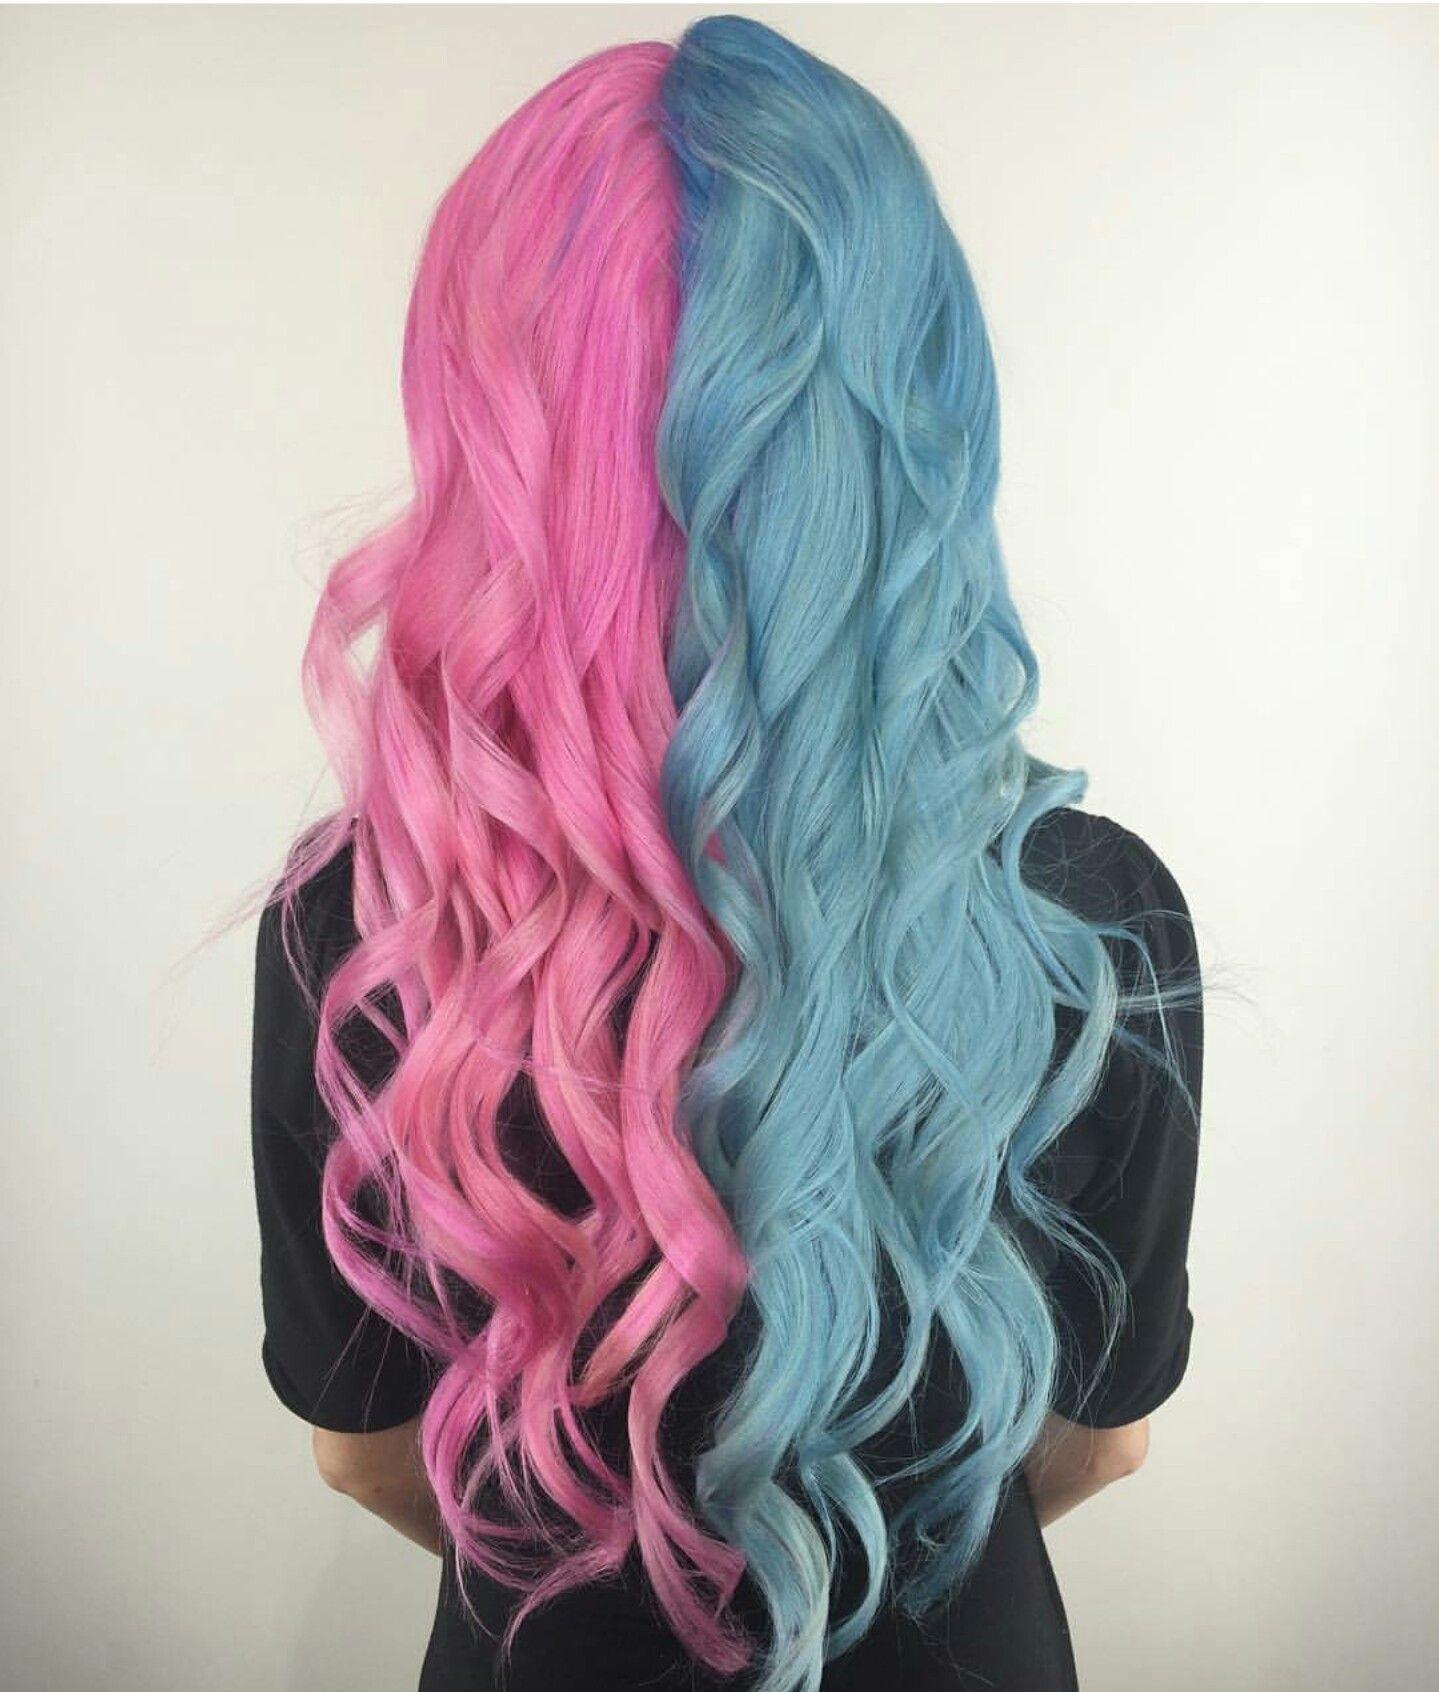 Pin By Amanda Soriano On Evalin S Curly Hair Split Dyed Hair Hair Styles Split Hair